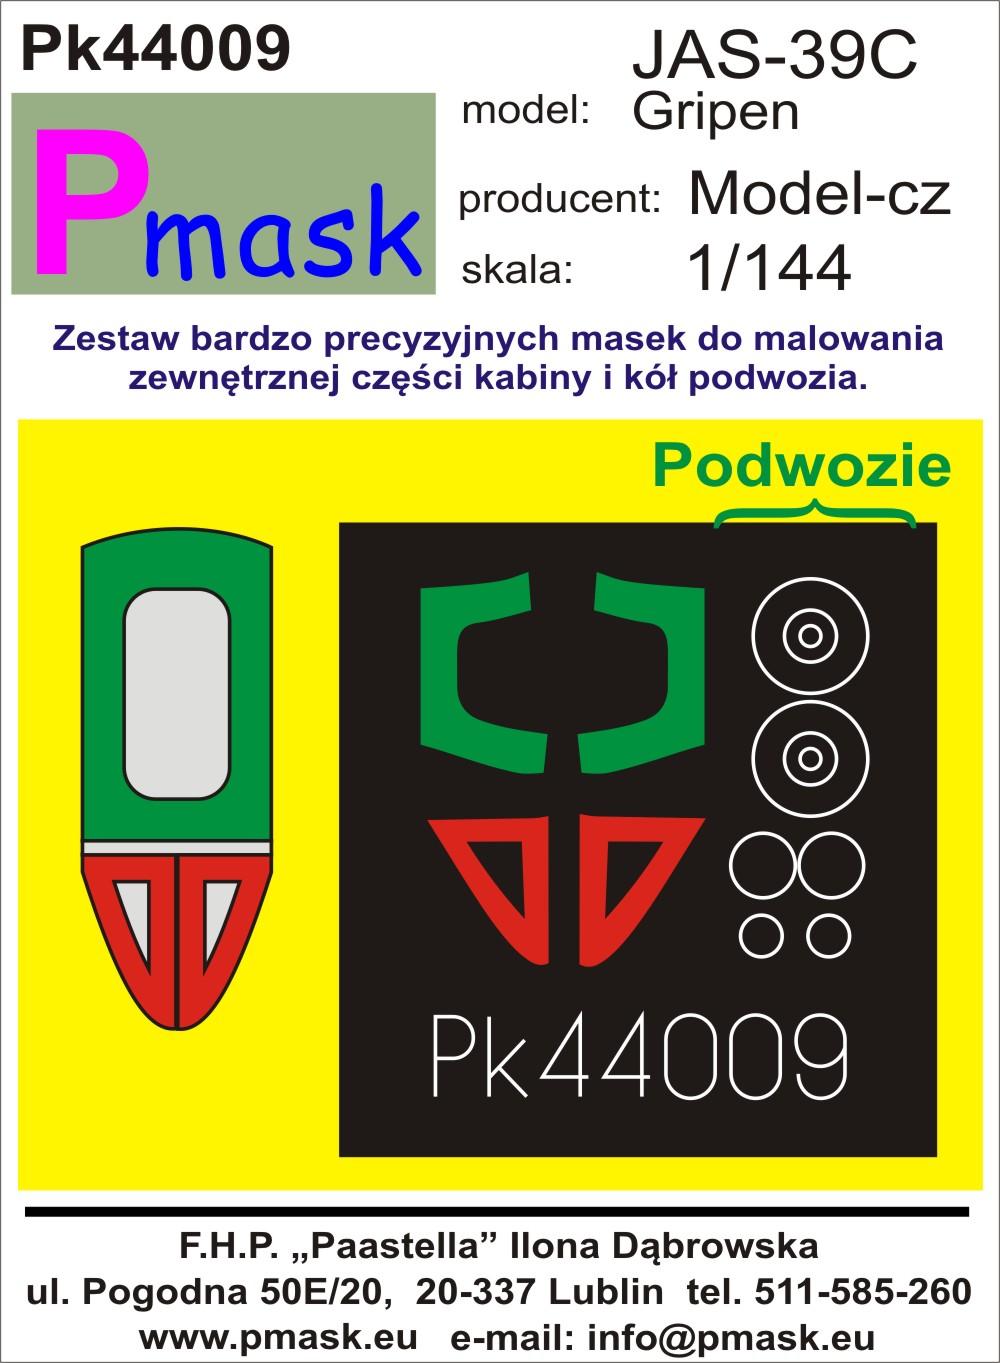 PK44009